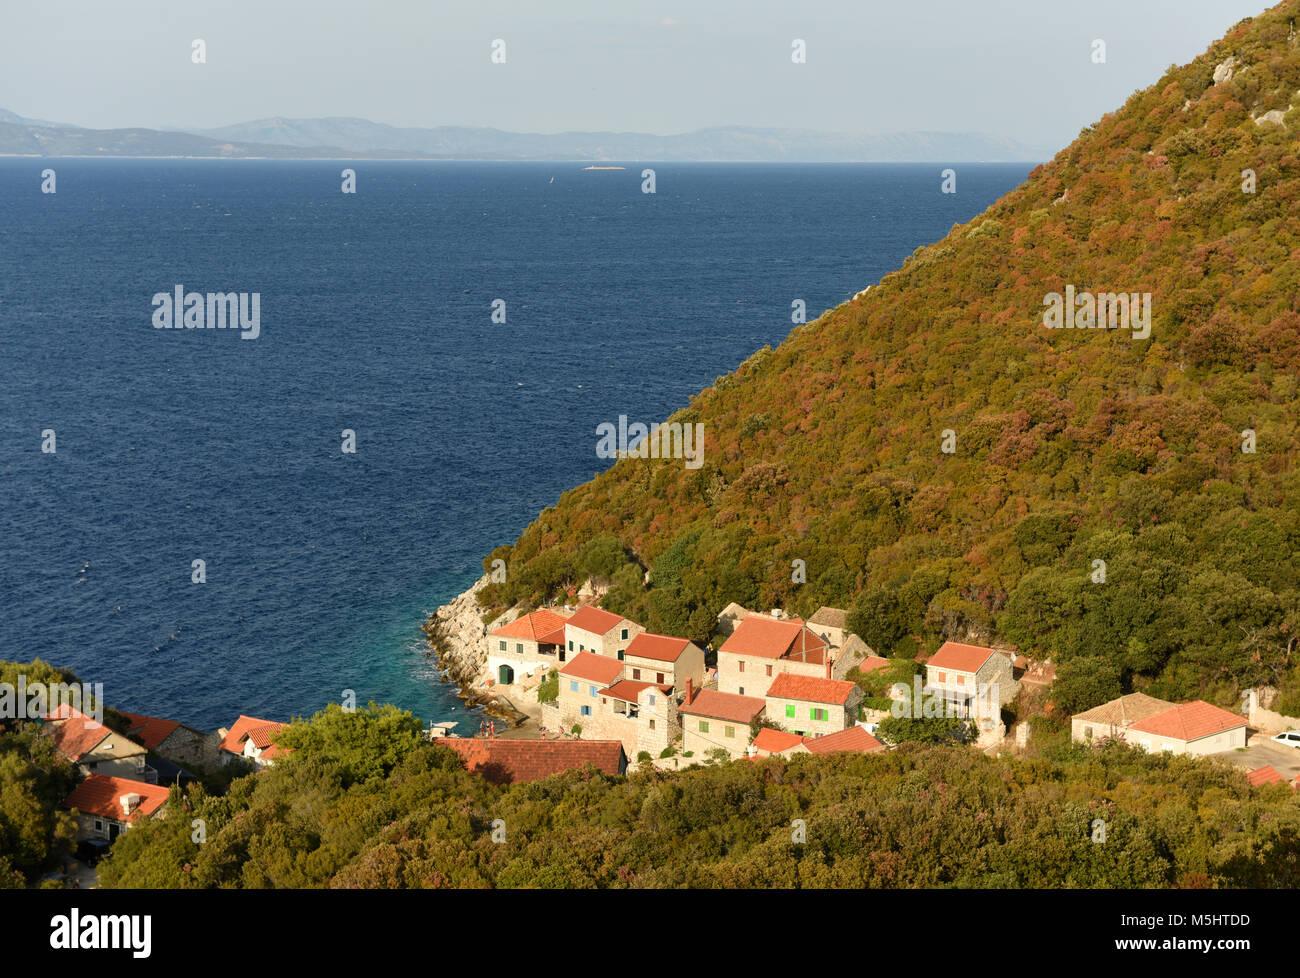 Luccica village on Lastovo island, Croatia. - Stock Image